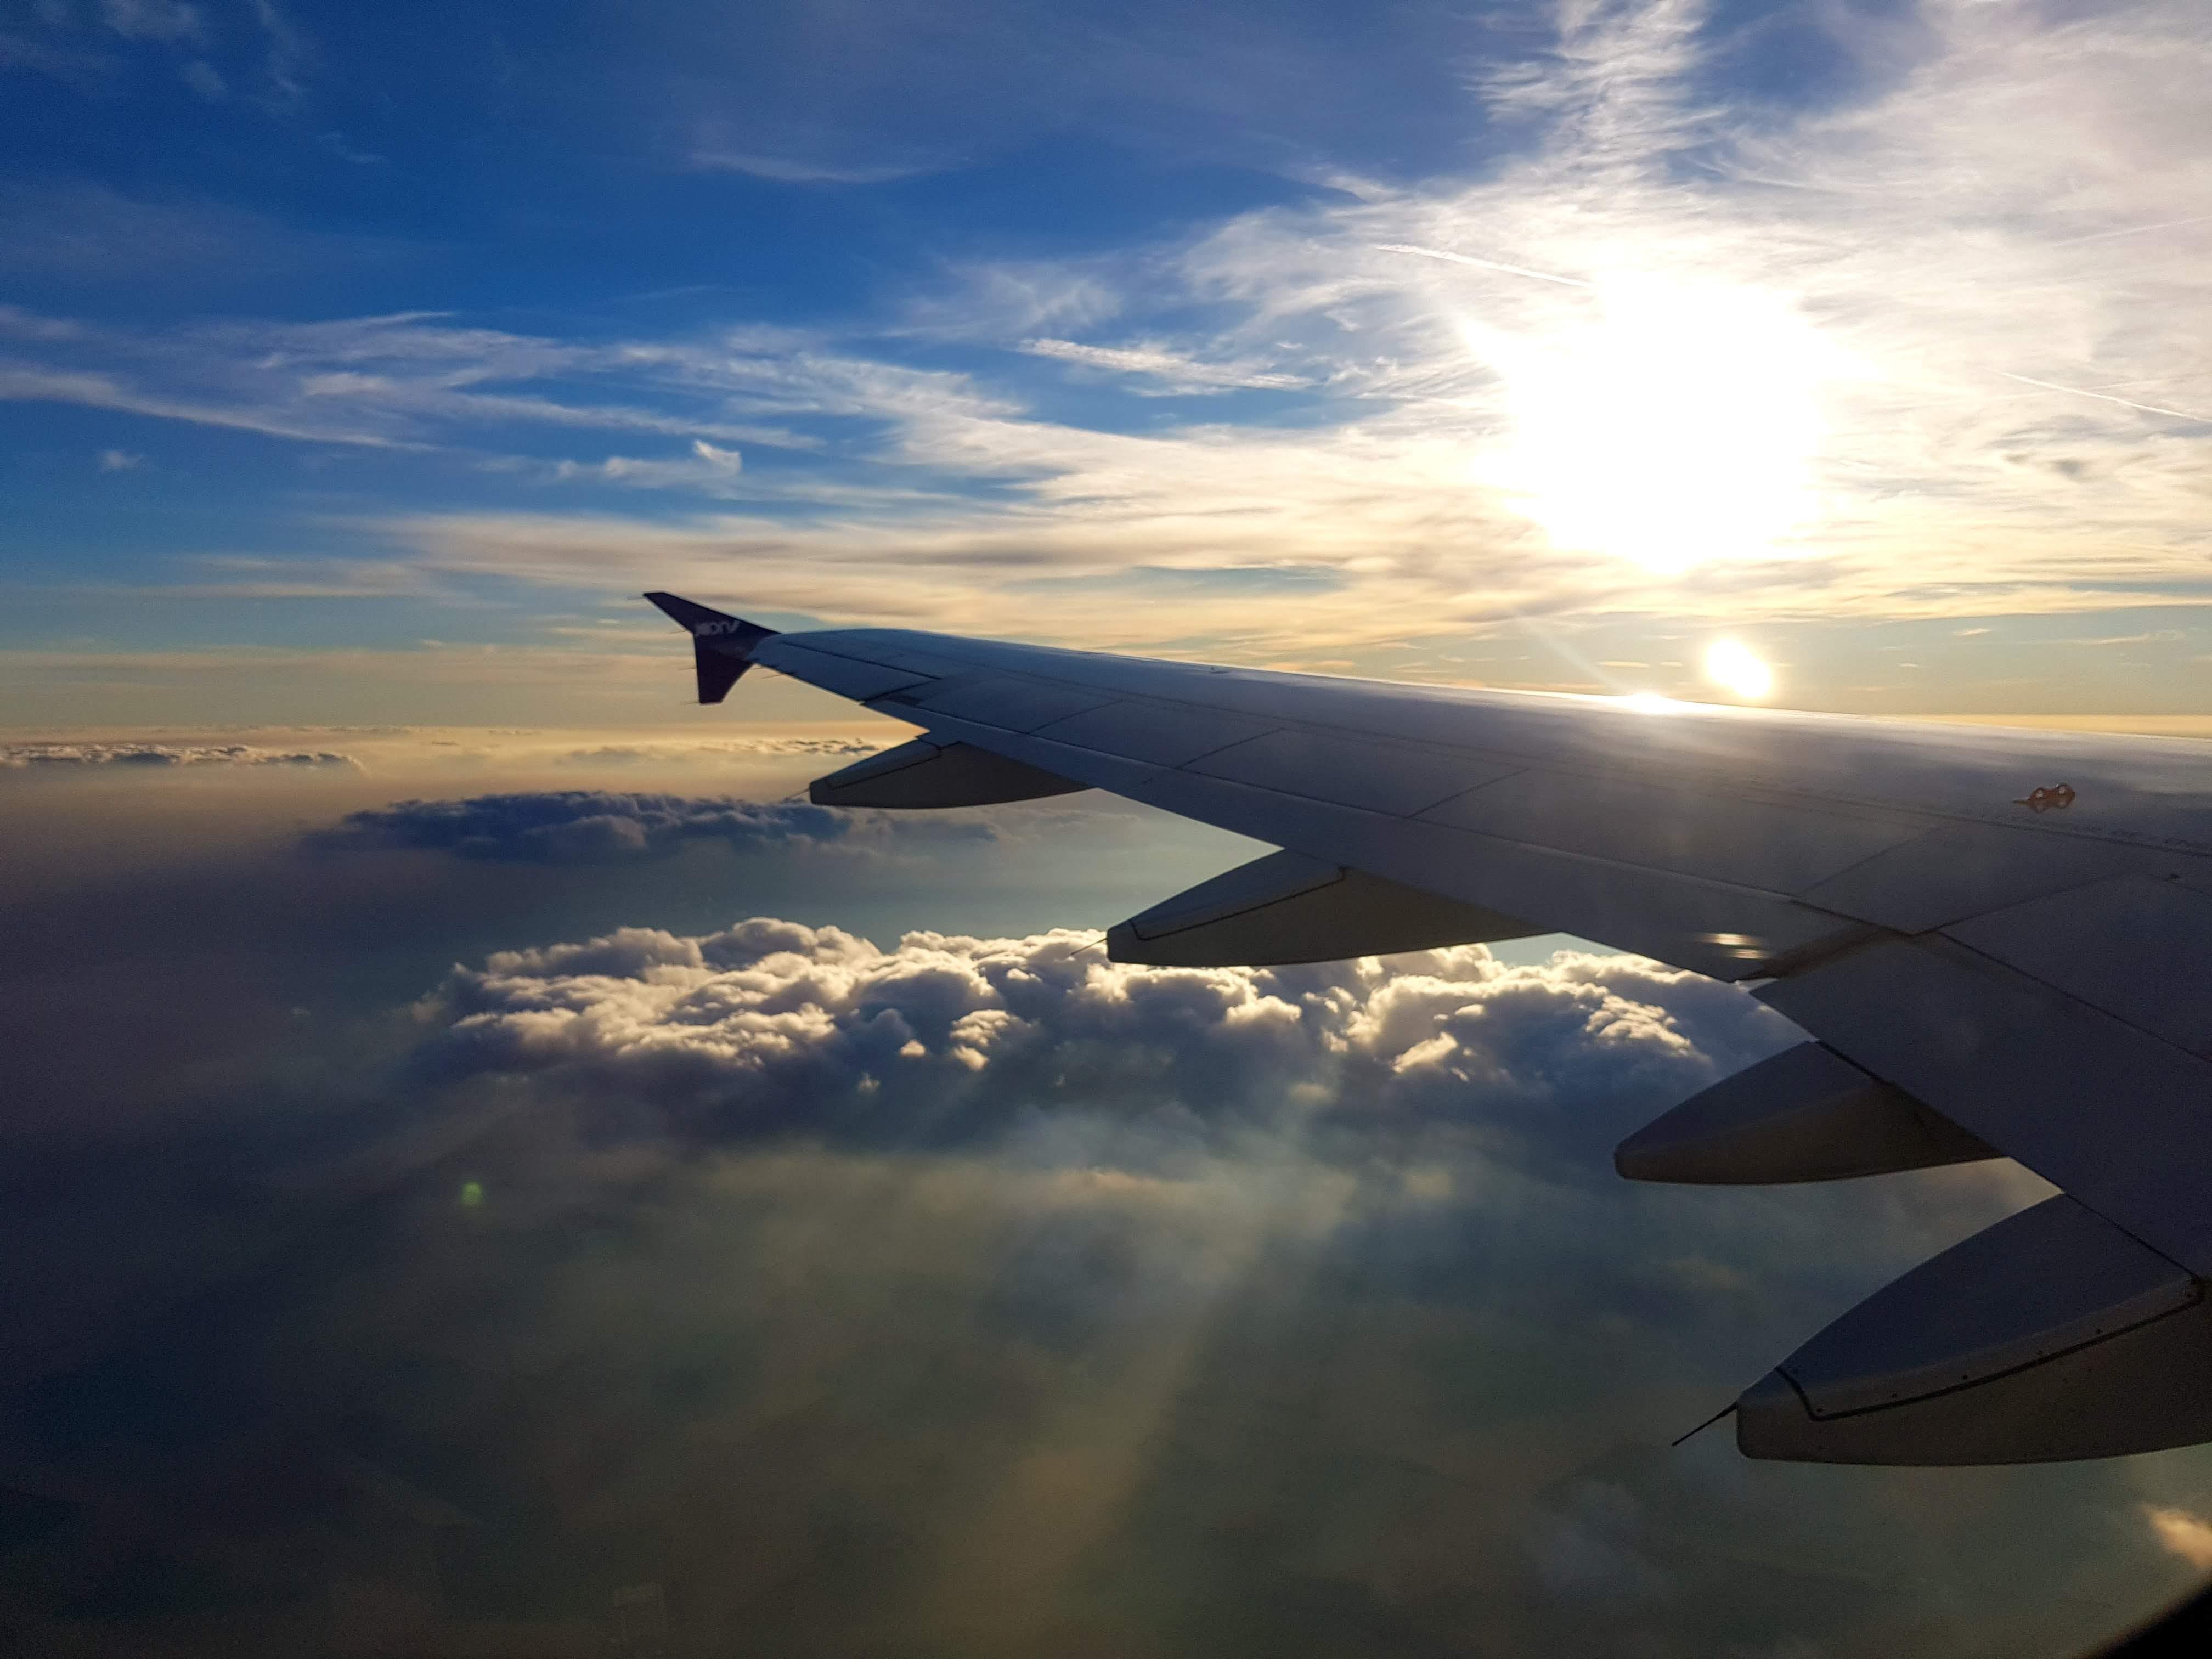 Free stock photo of airplane, cloud, dramatic sky